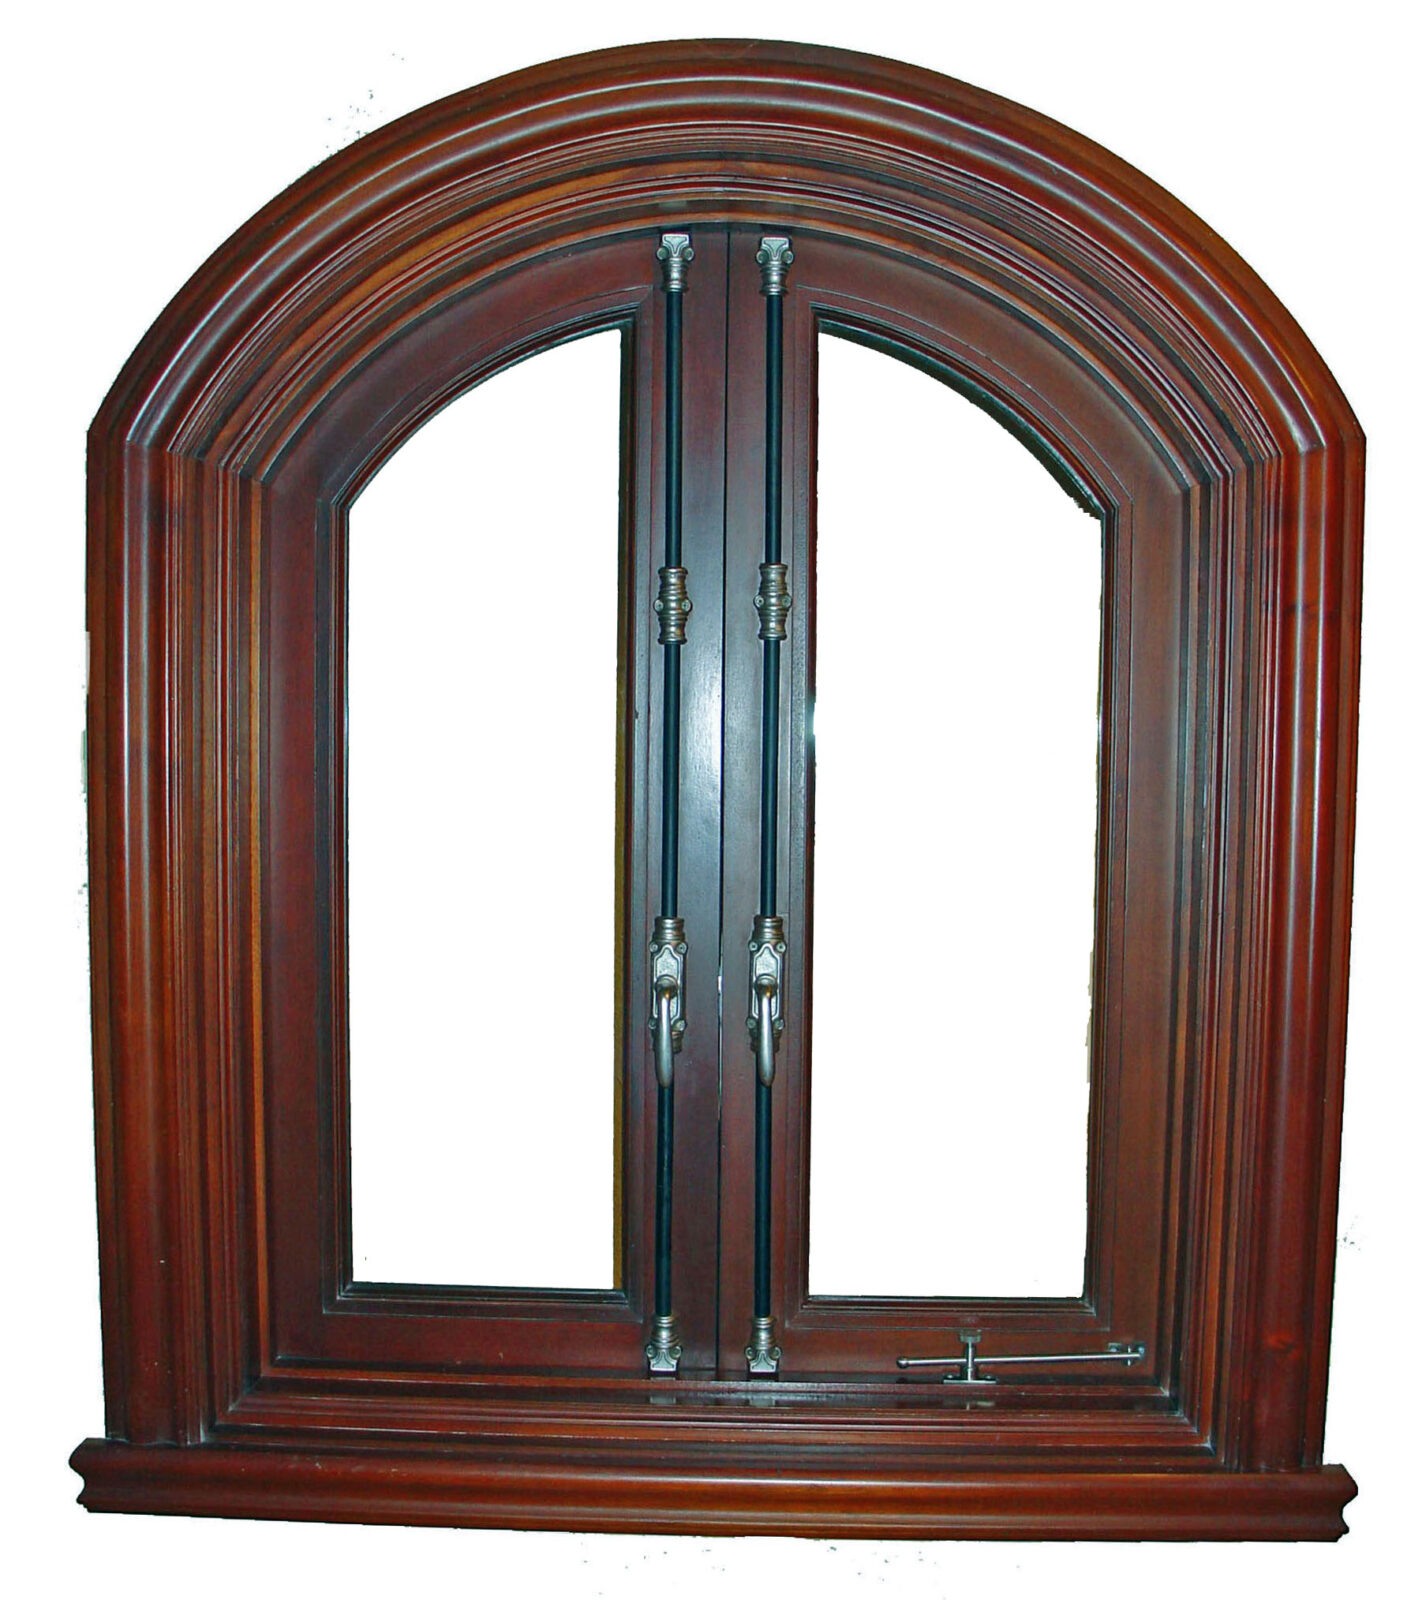 MIAMI MAHOGANY CASEMENT WINDOW